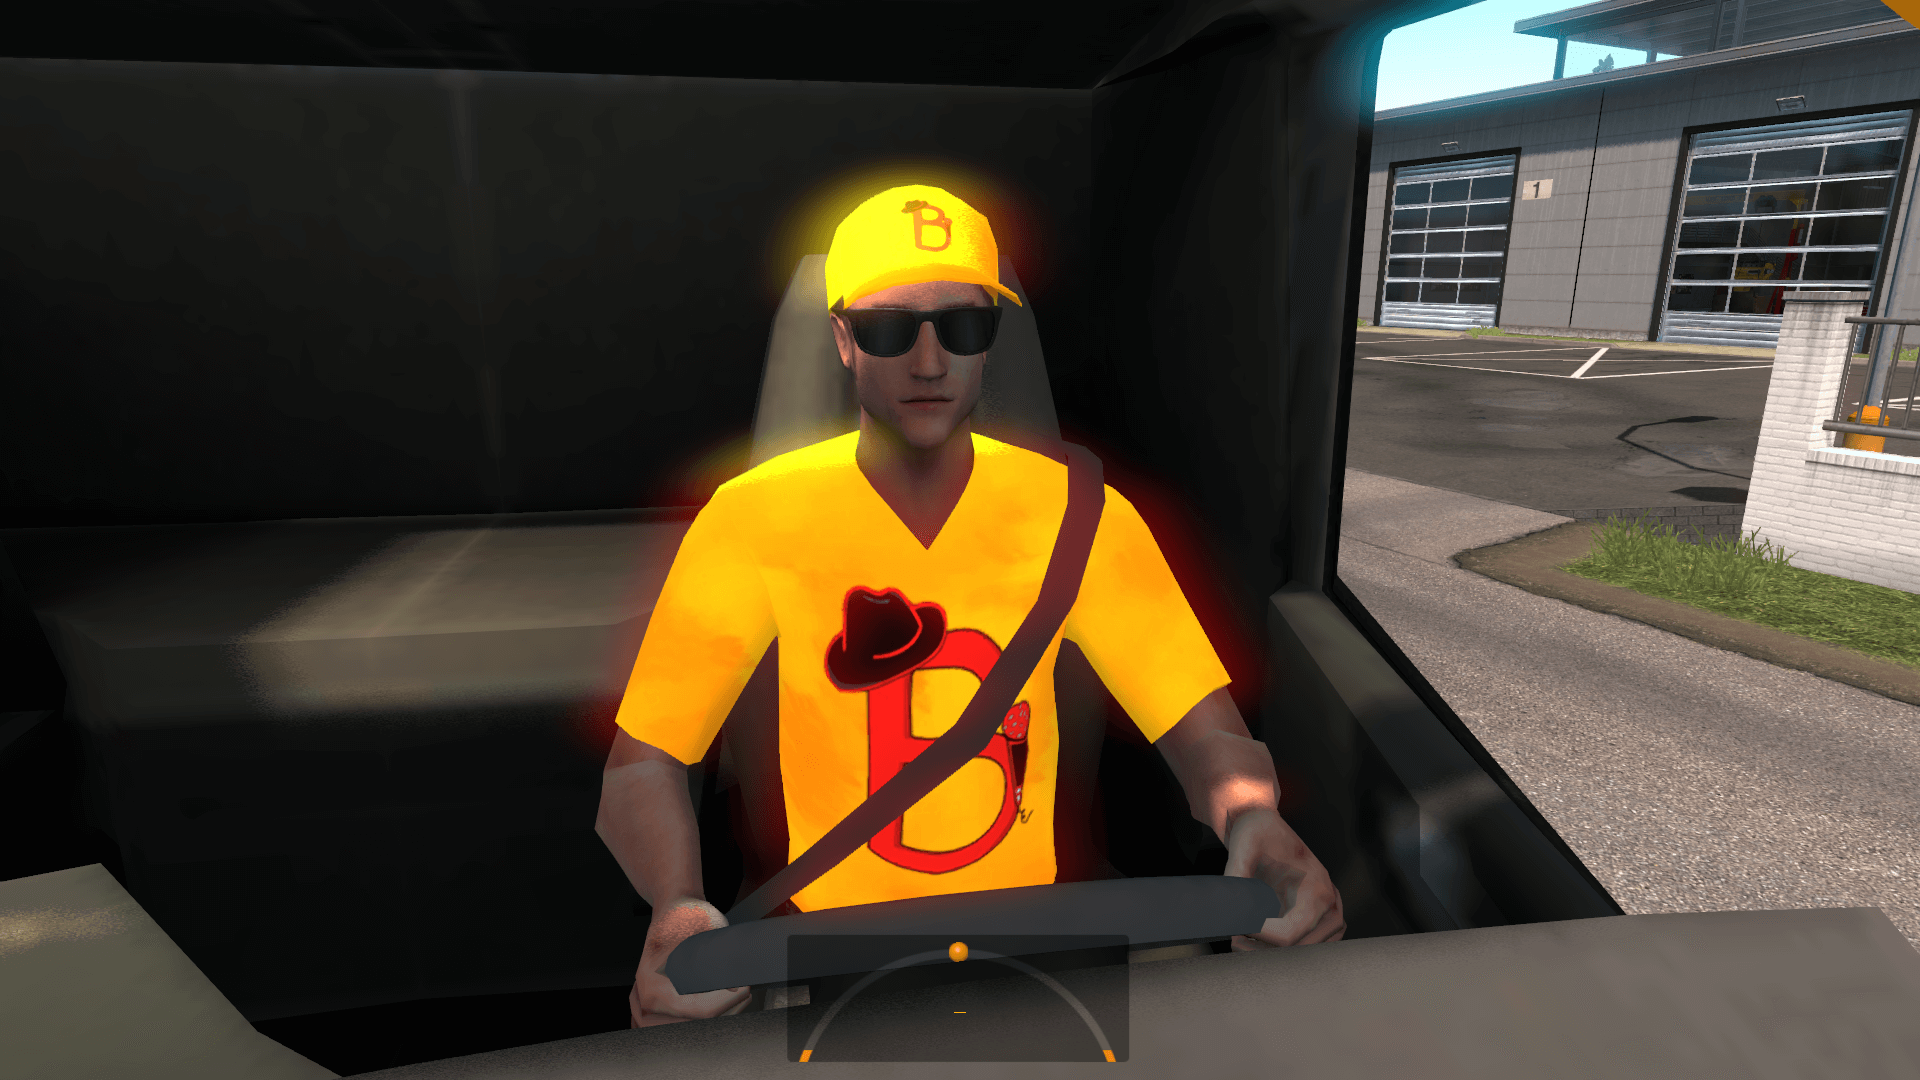 Bourákkkk Driver